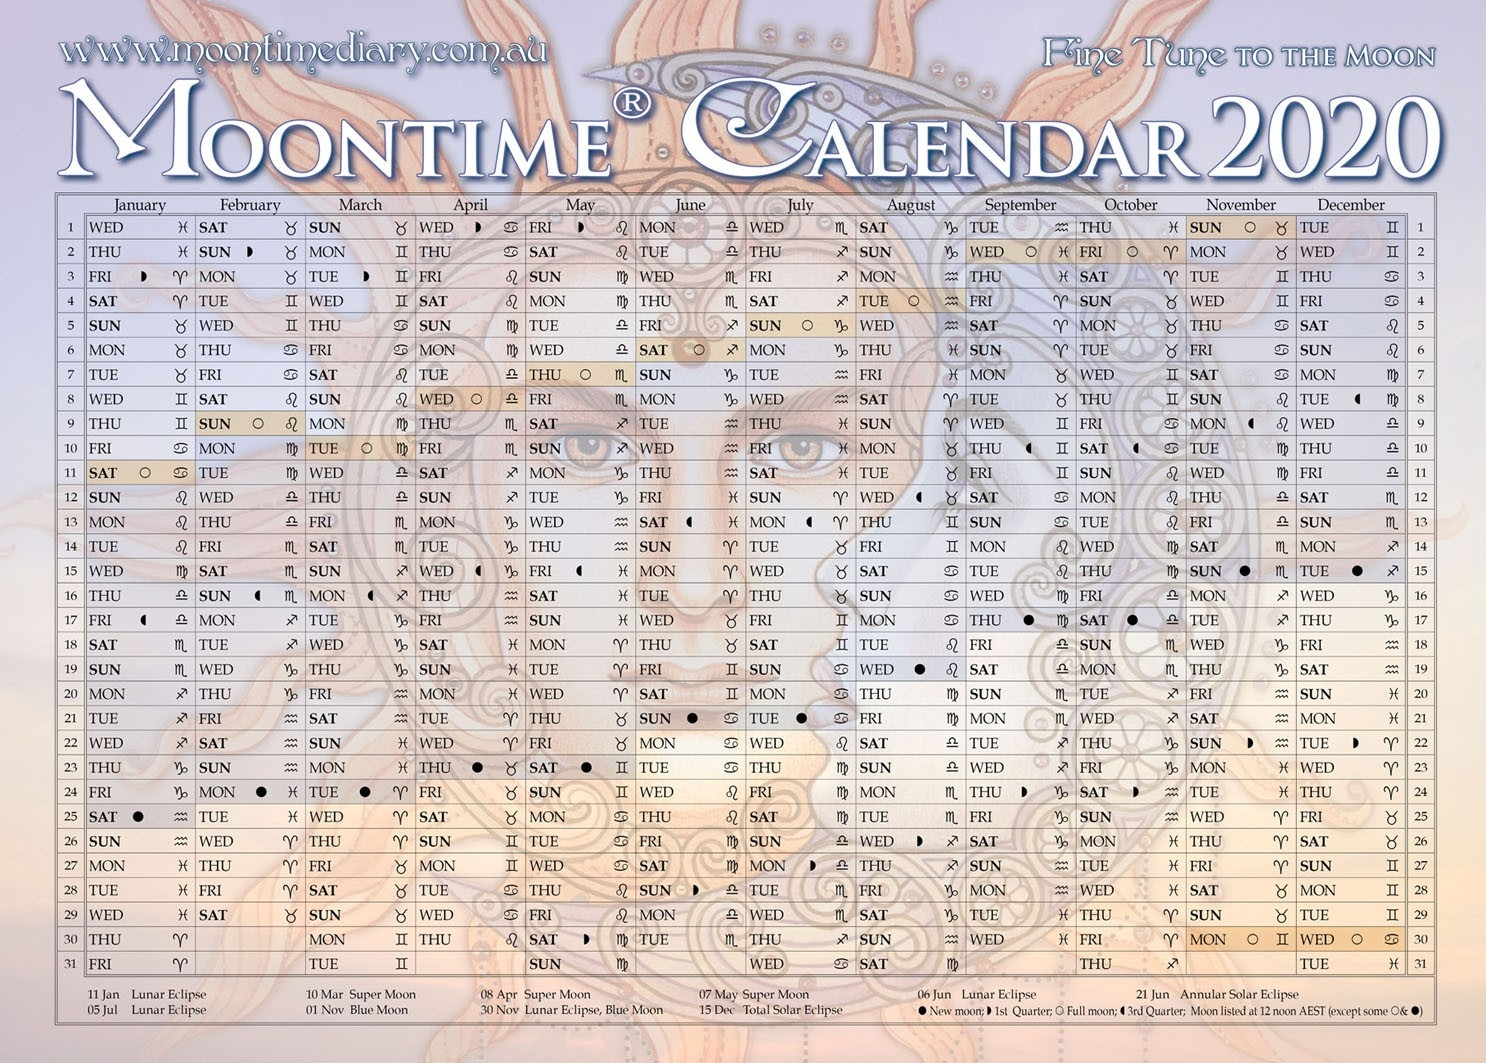 Moontime Calendar 2020  Solar Lunar Calendar - 2020